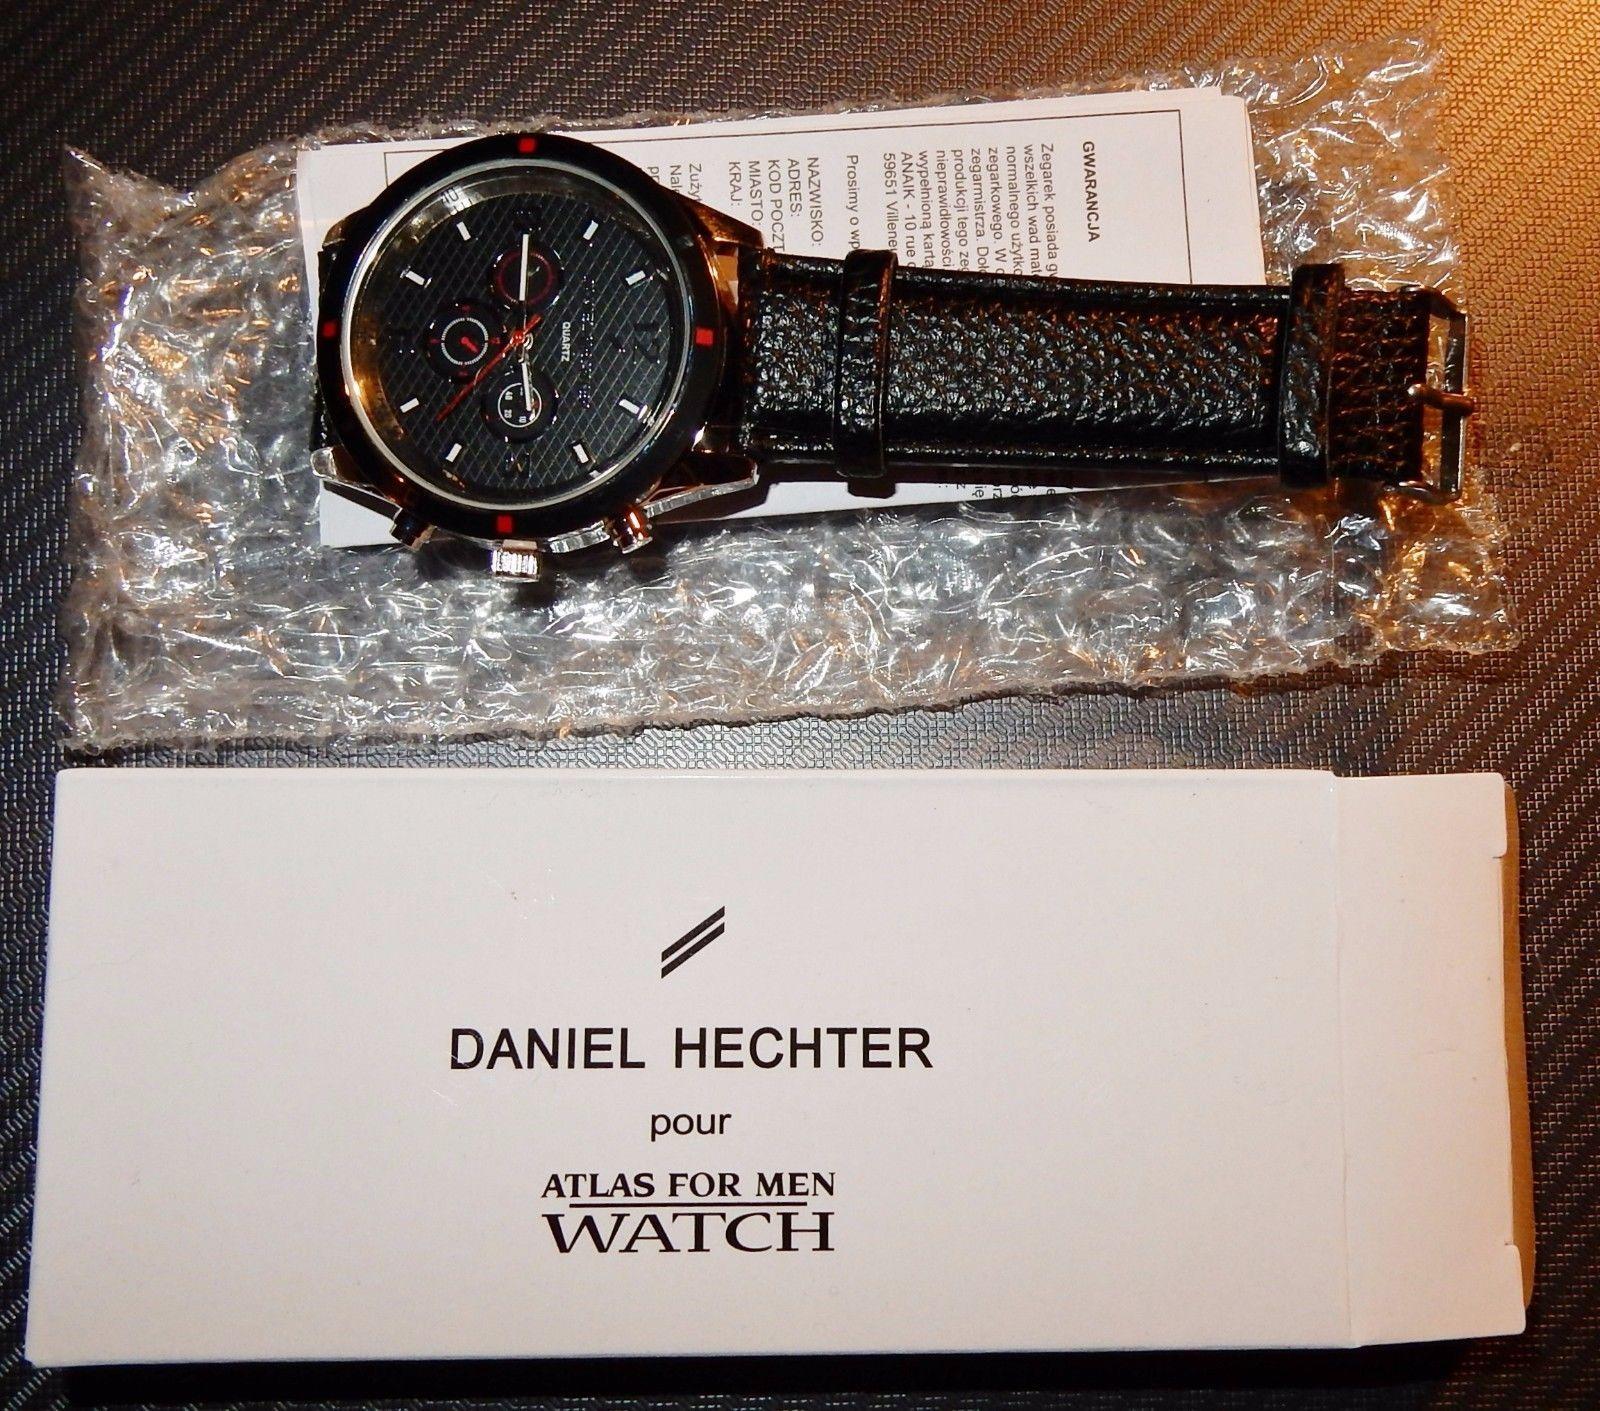 watch f68ce 761f6 Ebay Herrenuhren Herren Armbanduhr Uhr Daniel Hechter Atlas ...